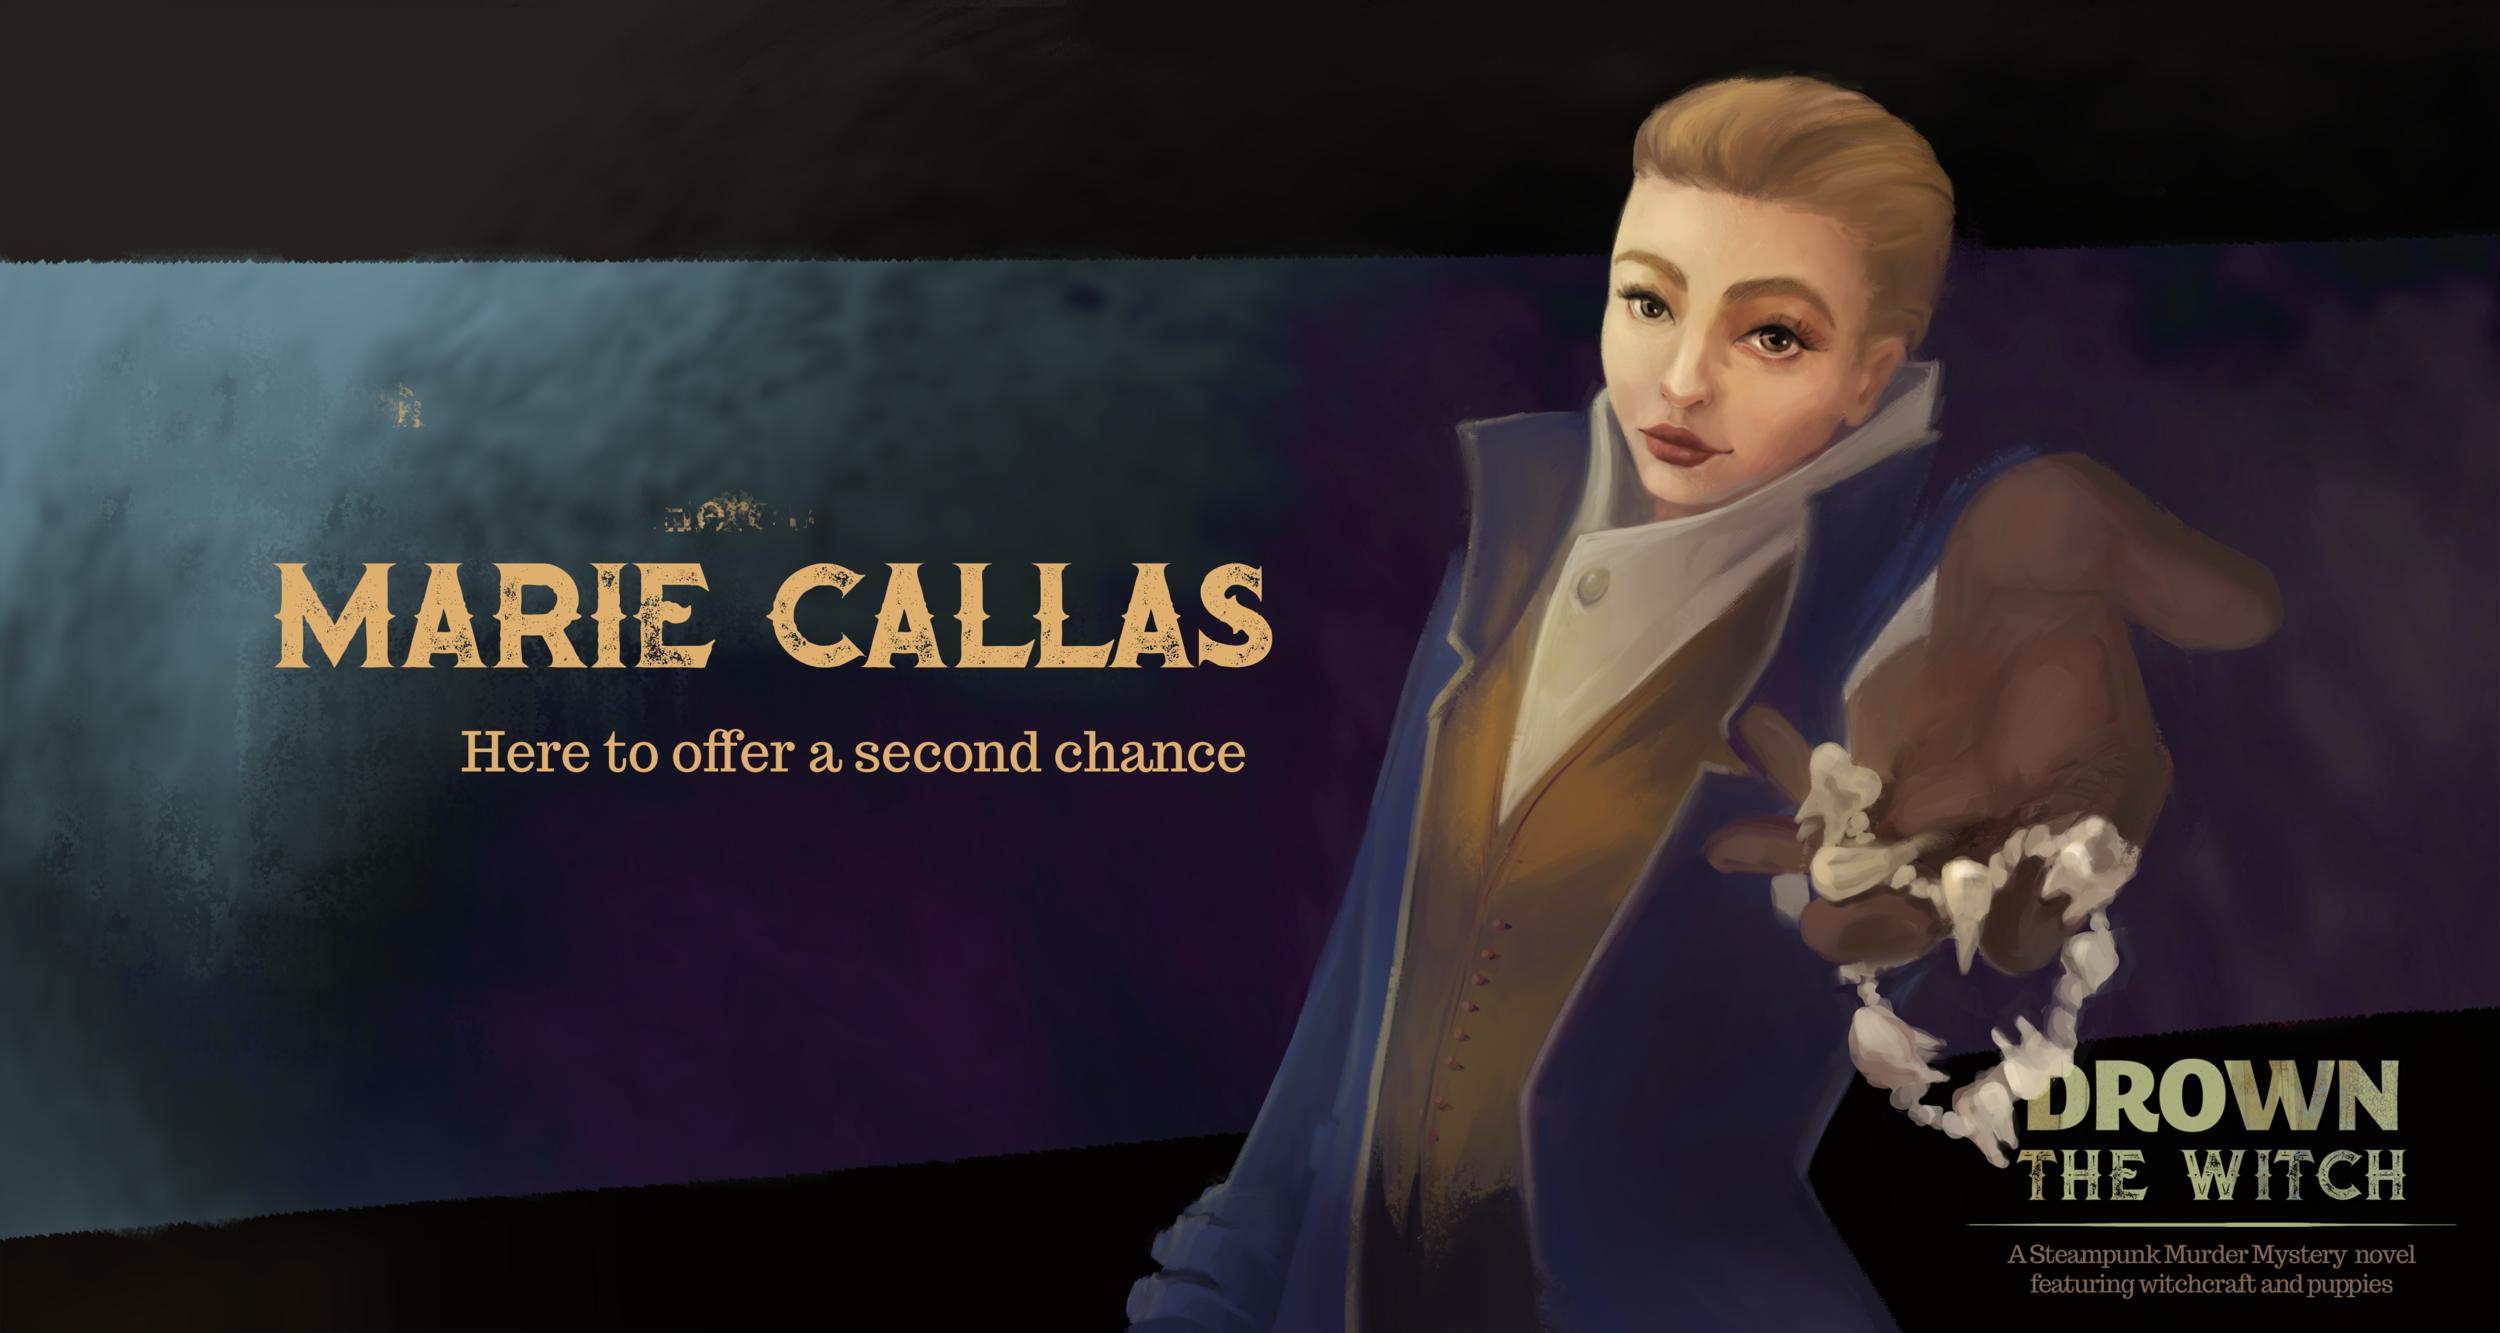 Marie Callas